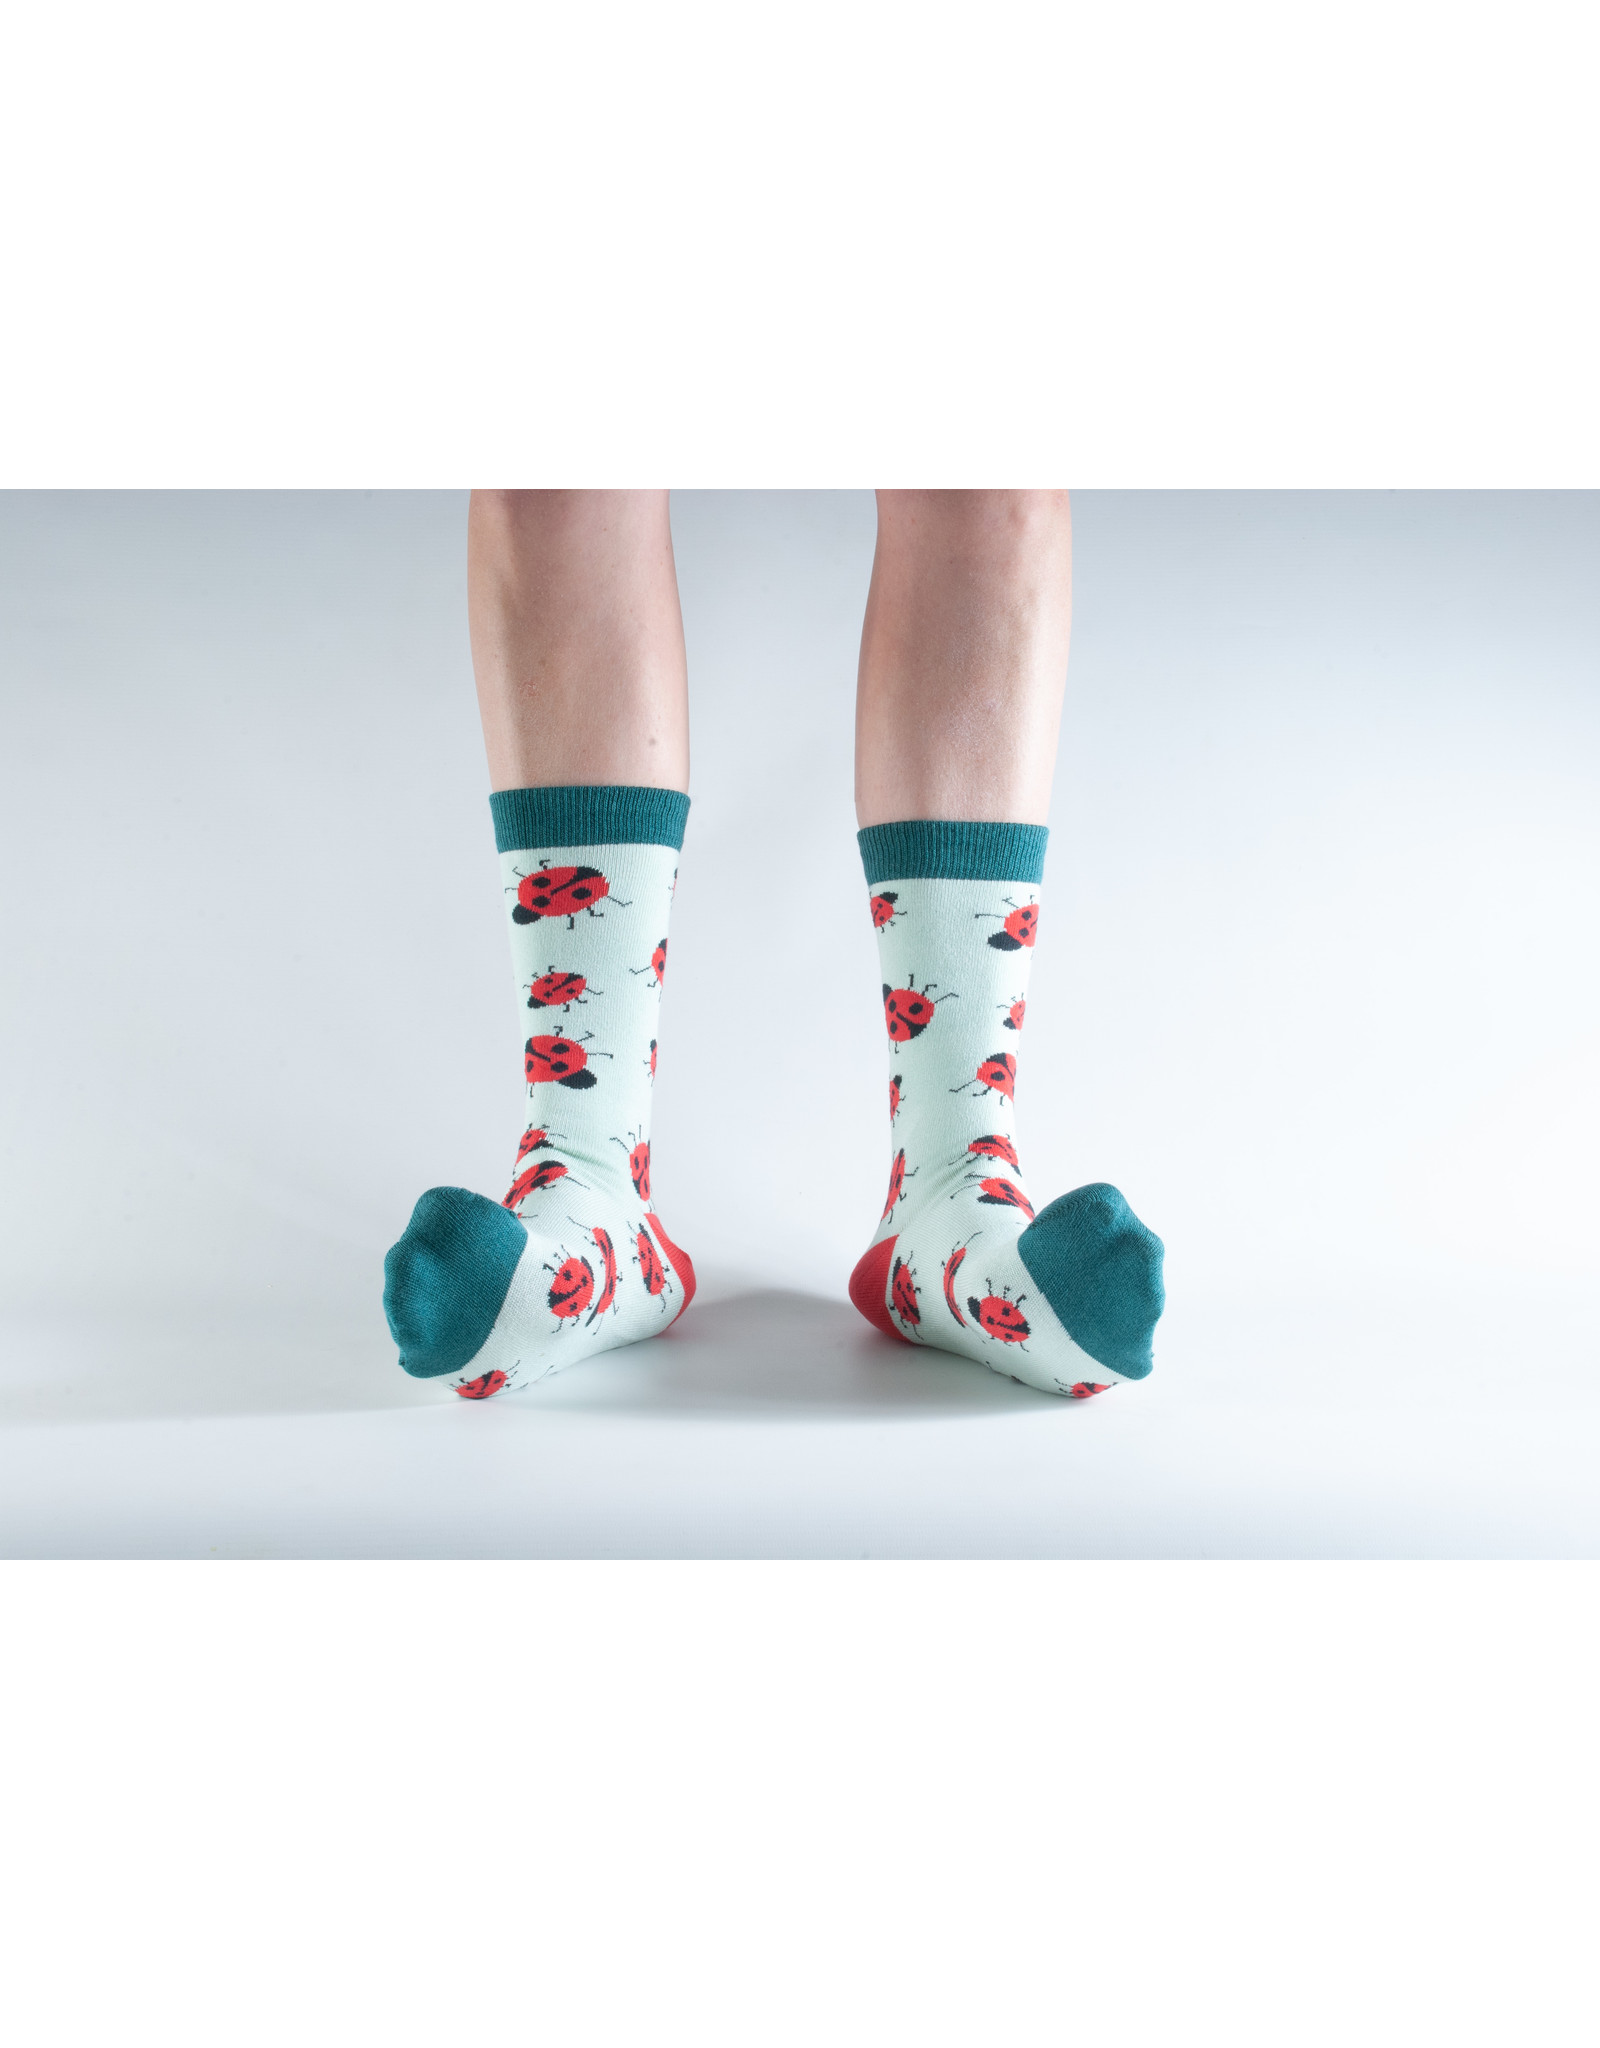 Doris & Dude Socks - ladybugs (36-40)